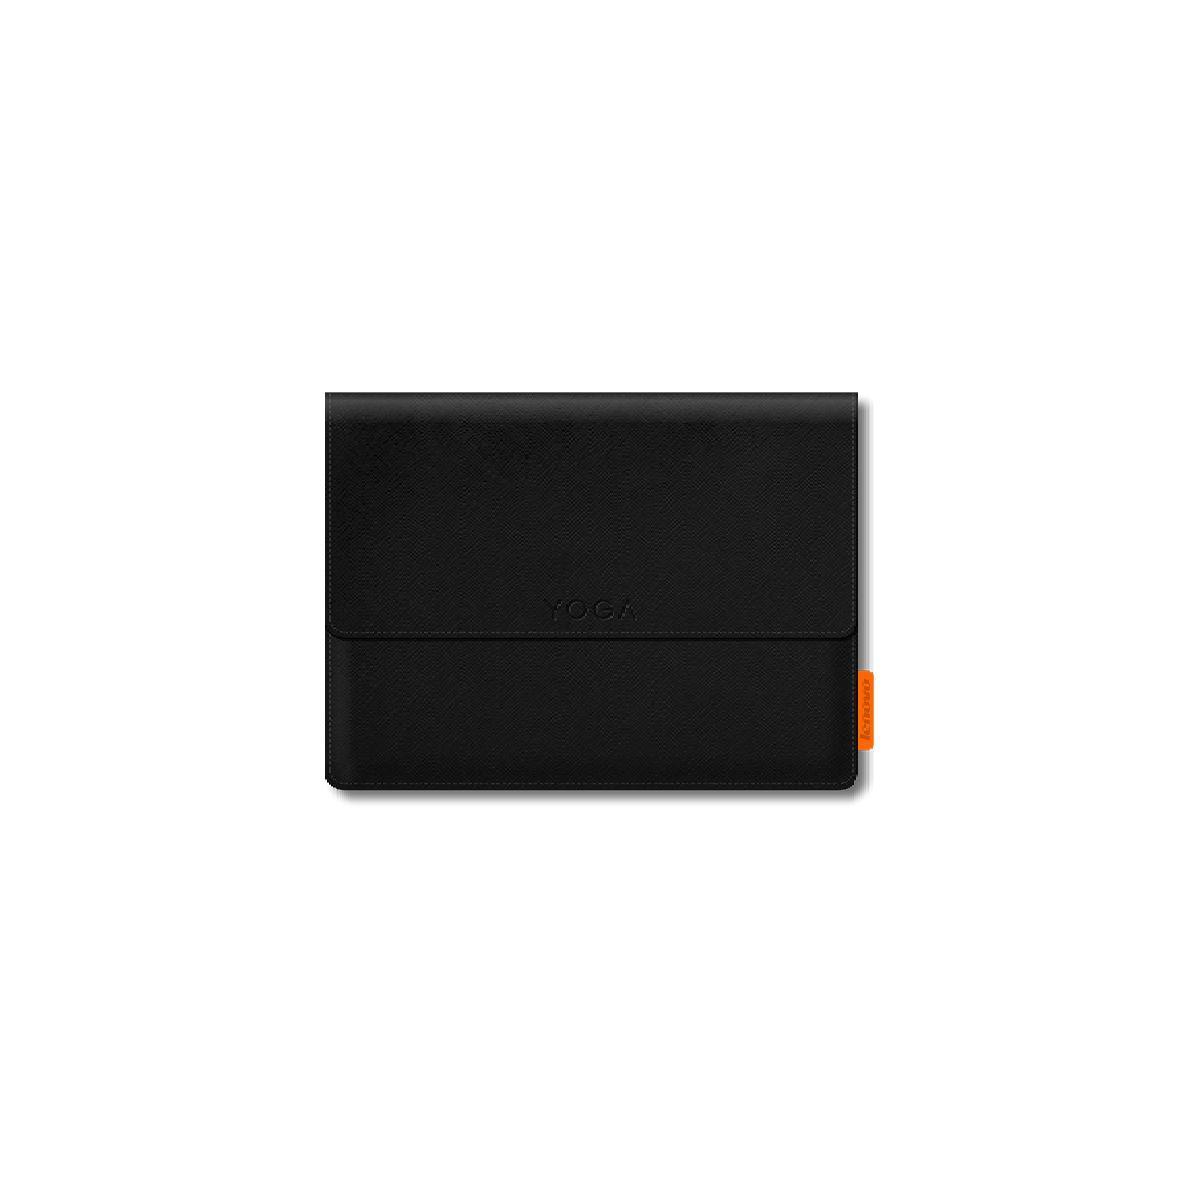 Etui lenovo yoga tablet 3 noir + protège - 20% de remise immédiate avec le code : multi20 (photo)